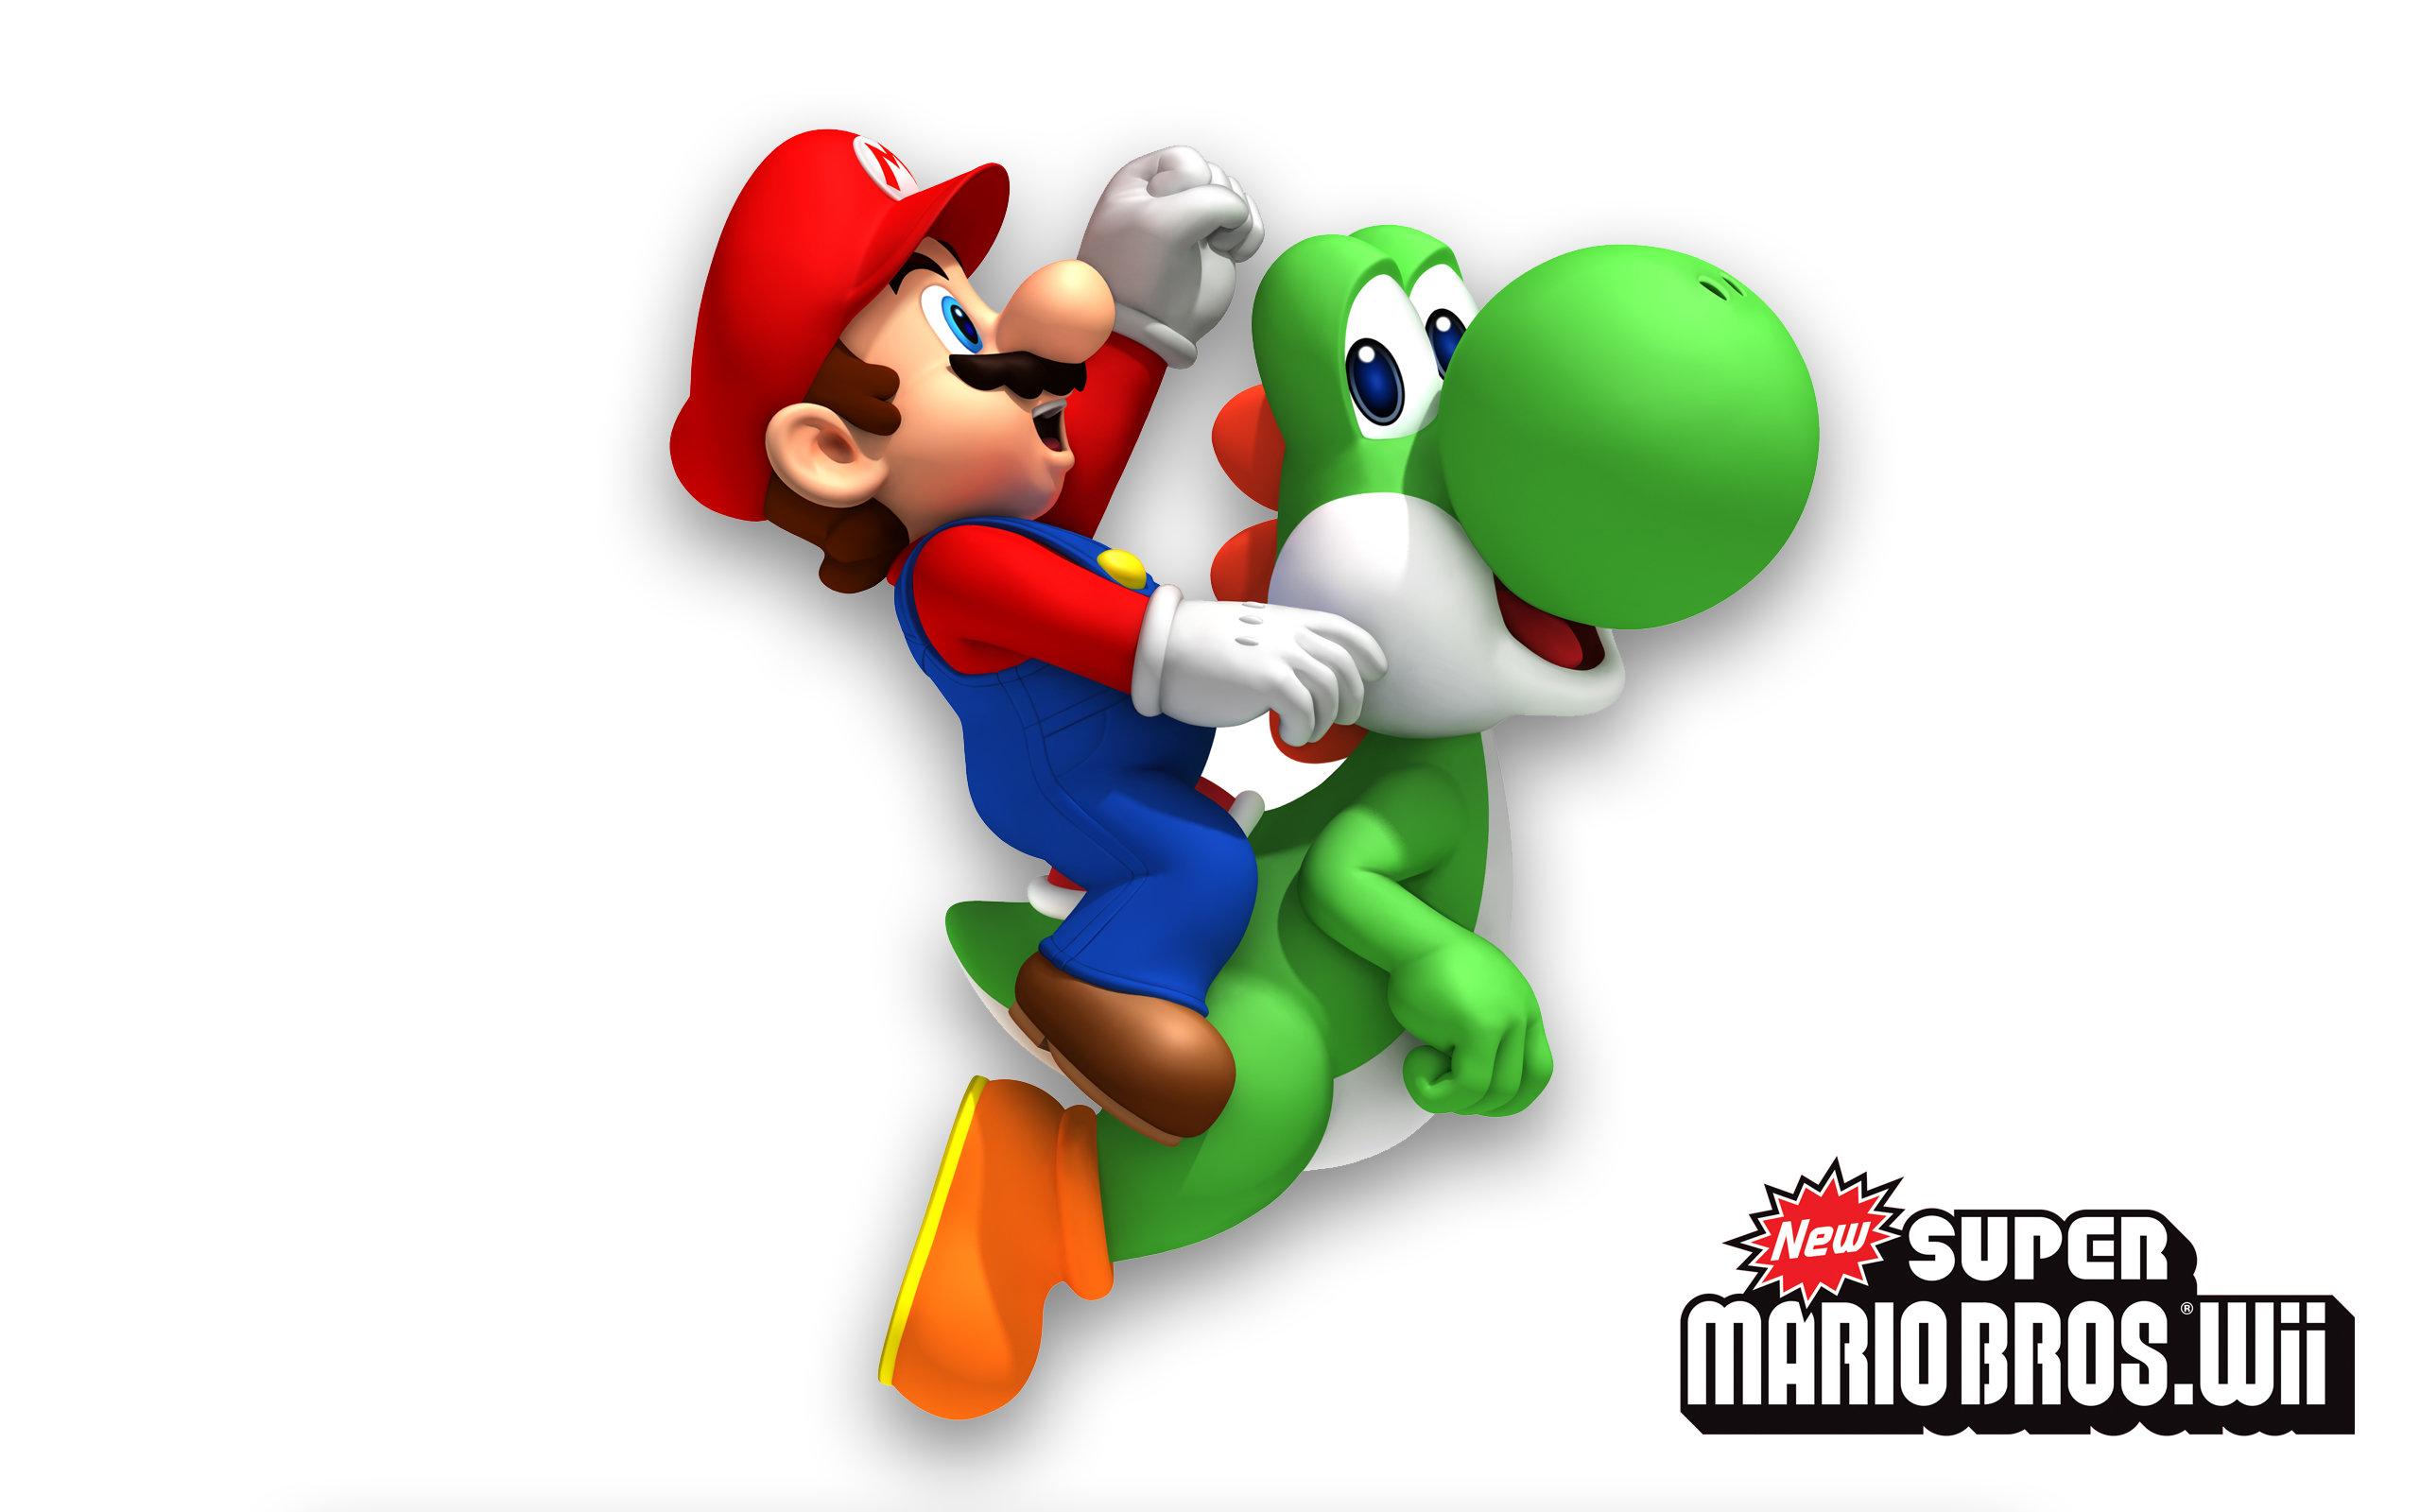 New Super Mario Bros Wii Wallpapers Hd For Desktop Backgrounds